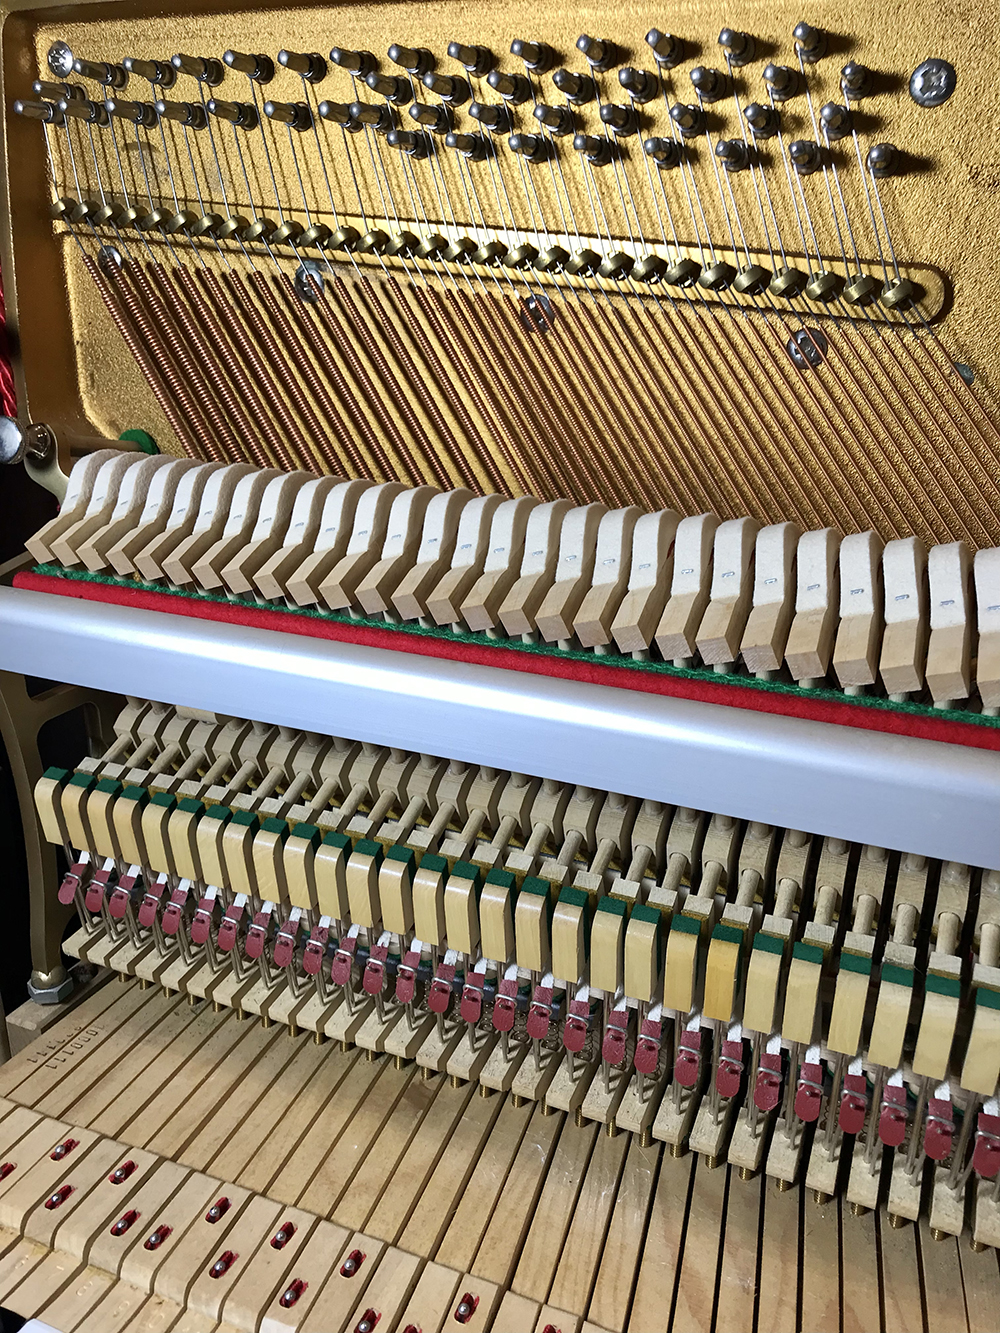 woodchester-upright-used-Piano-Dorset-2.jpg